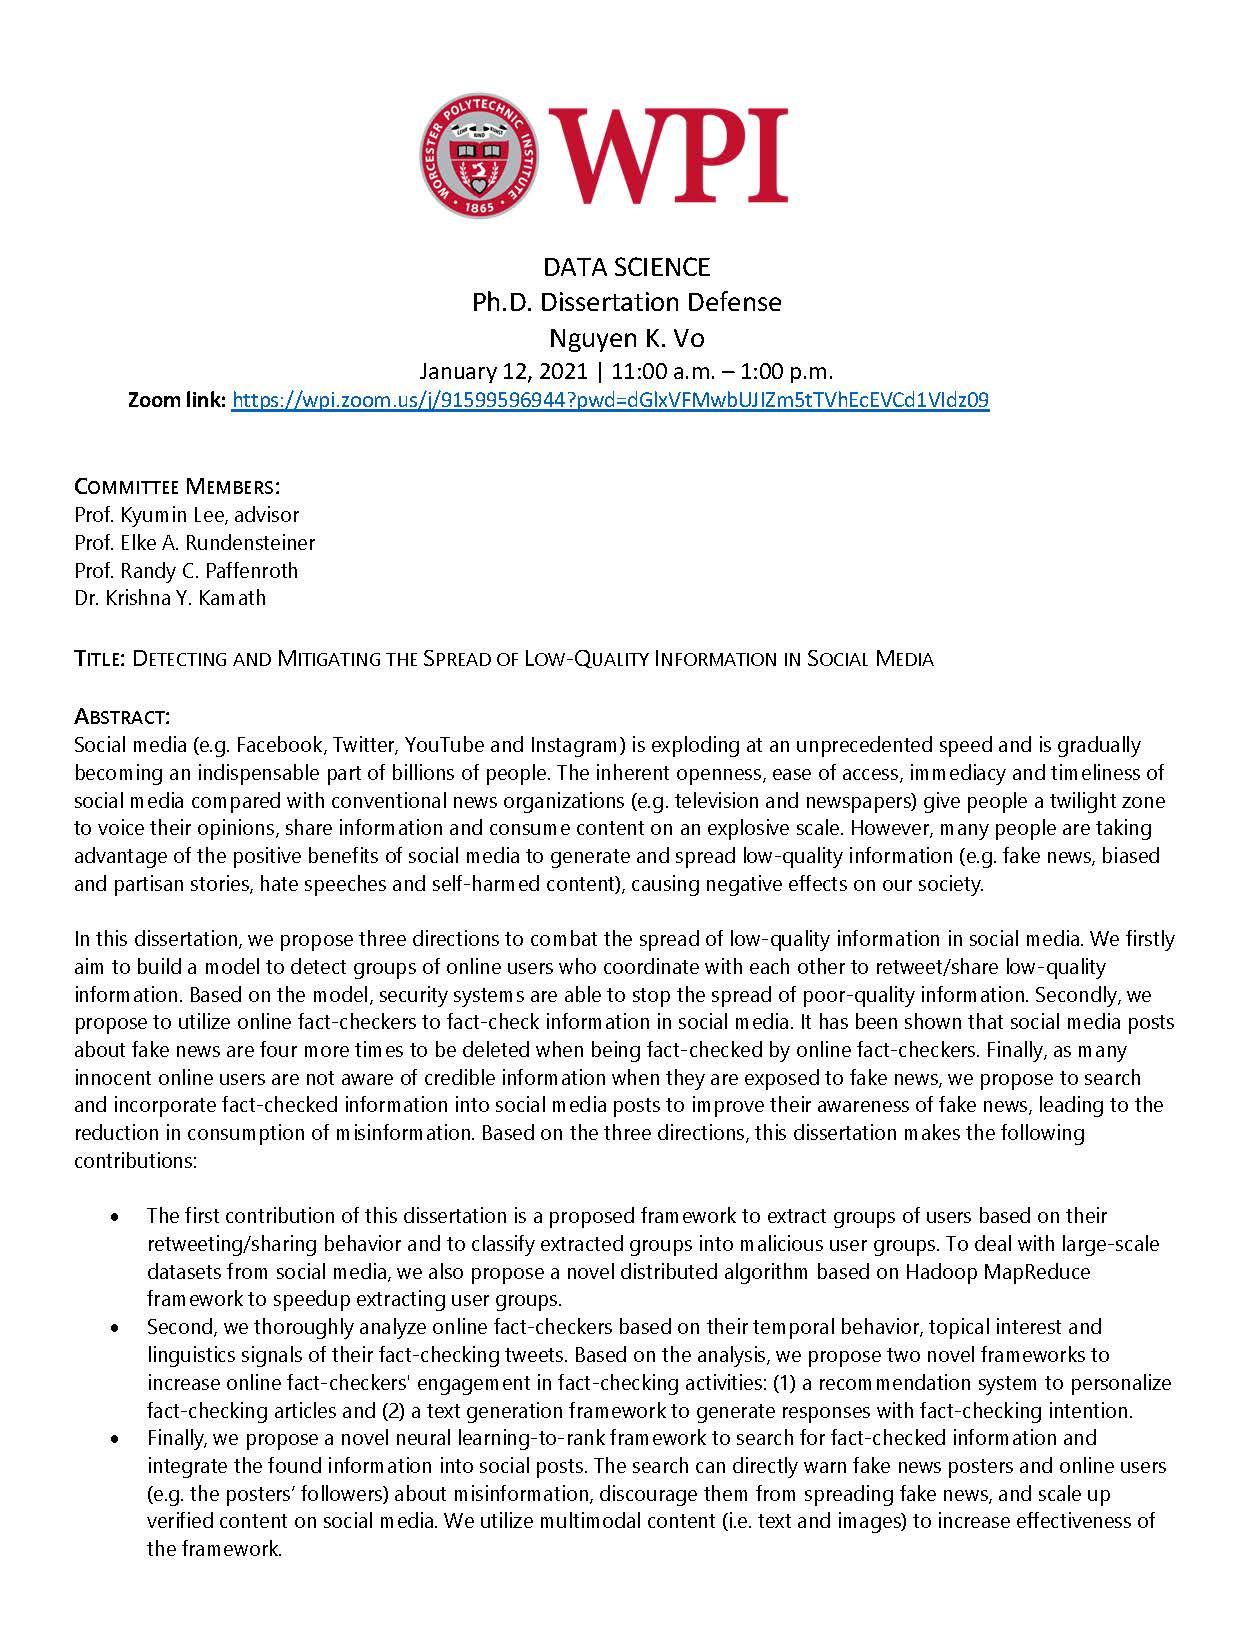 Ph.D. Dissertation Defense Nguyen K. Vo alt